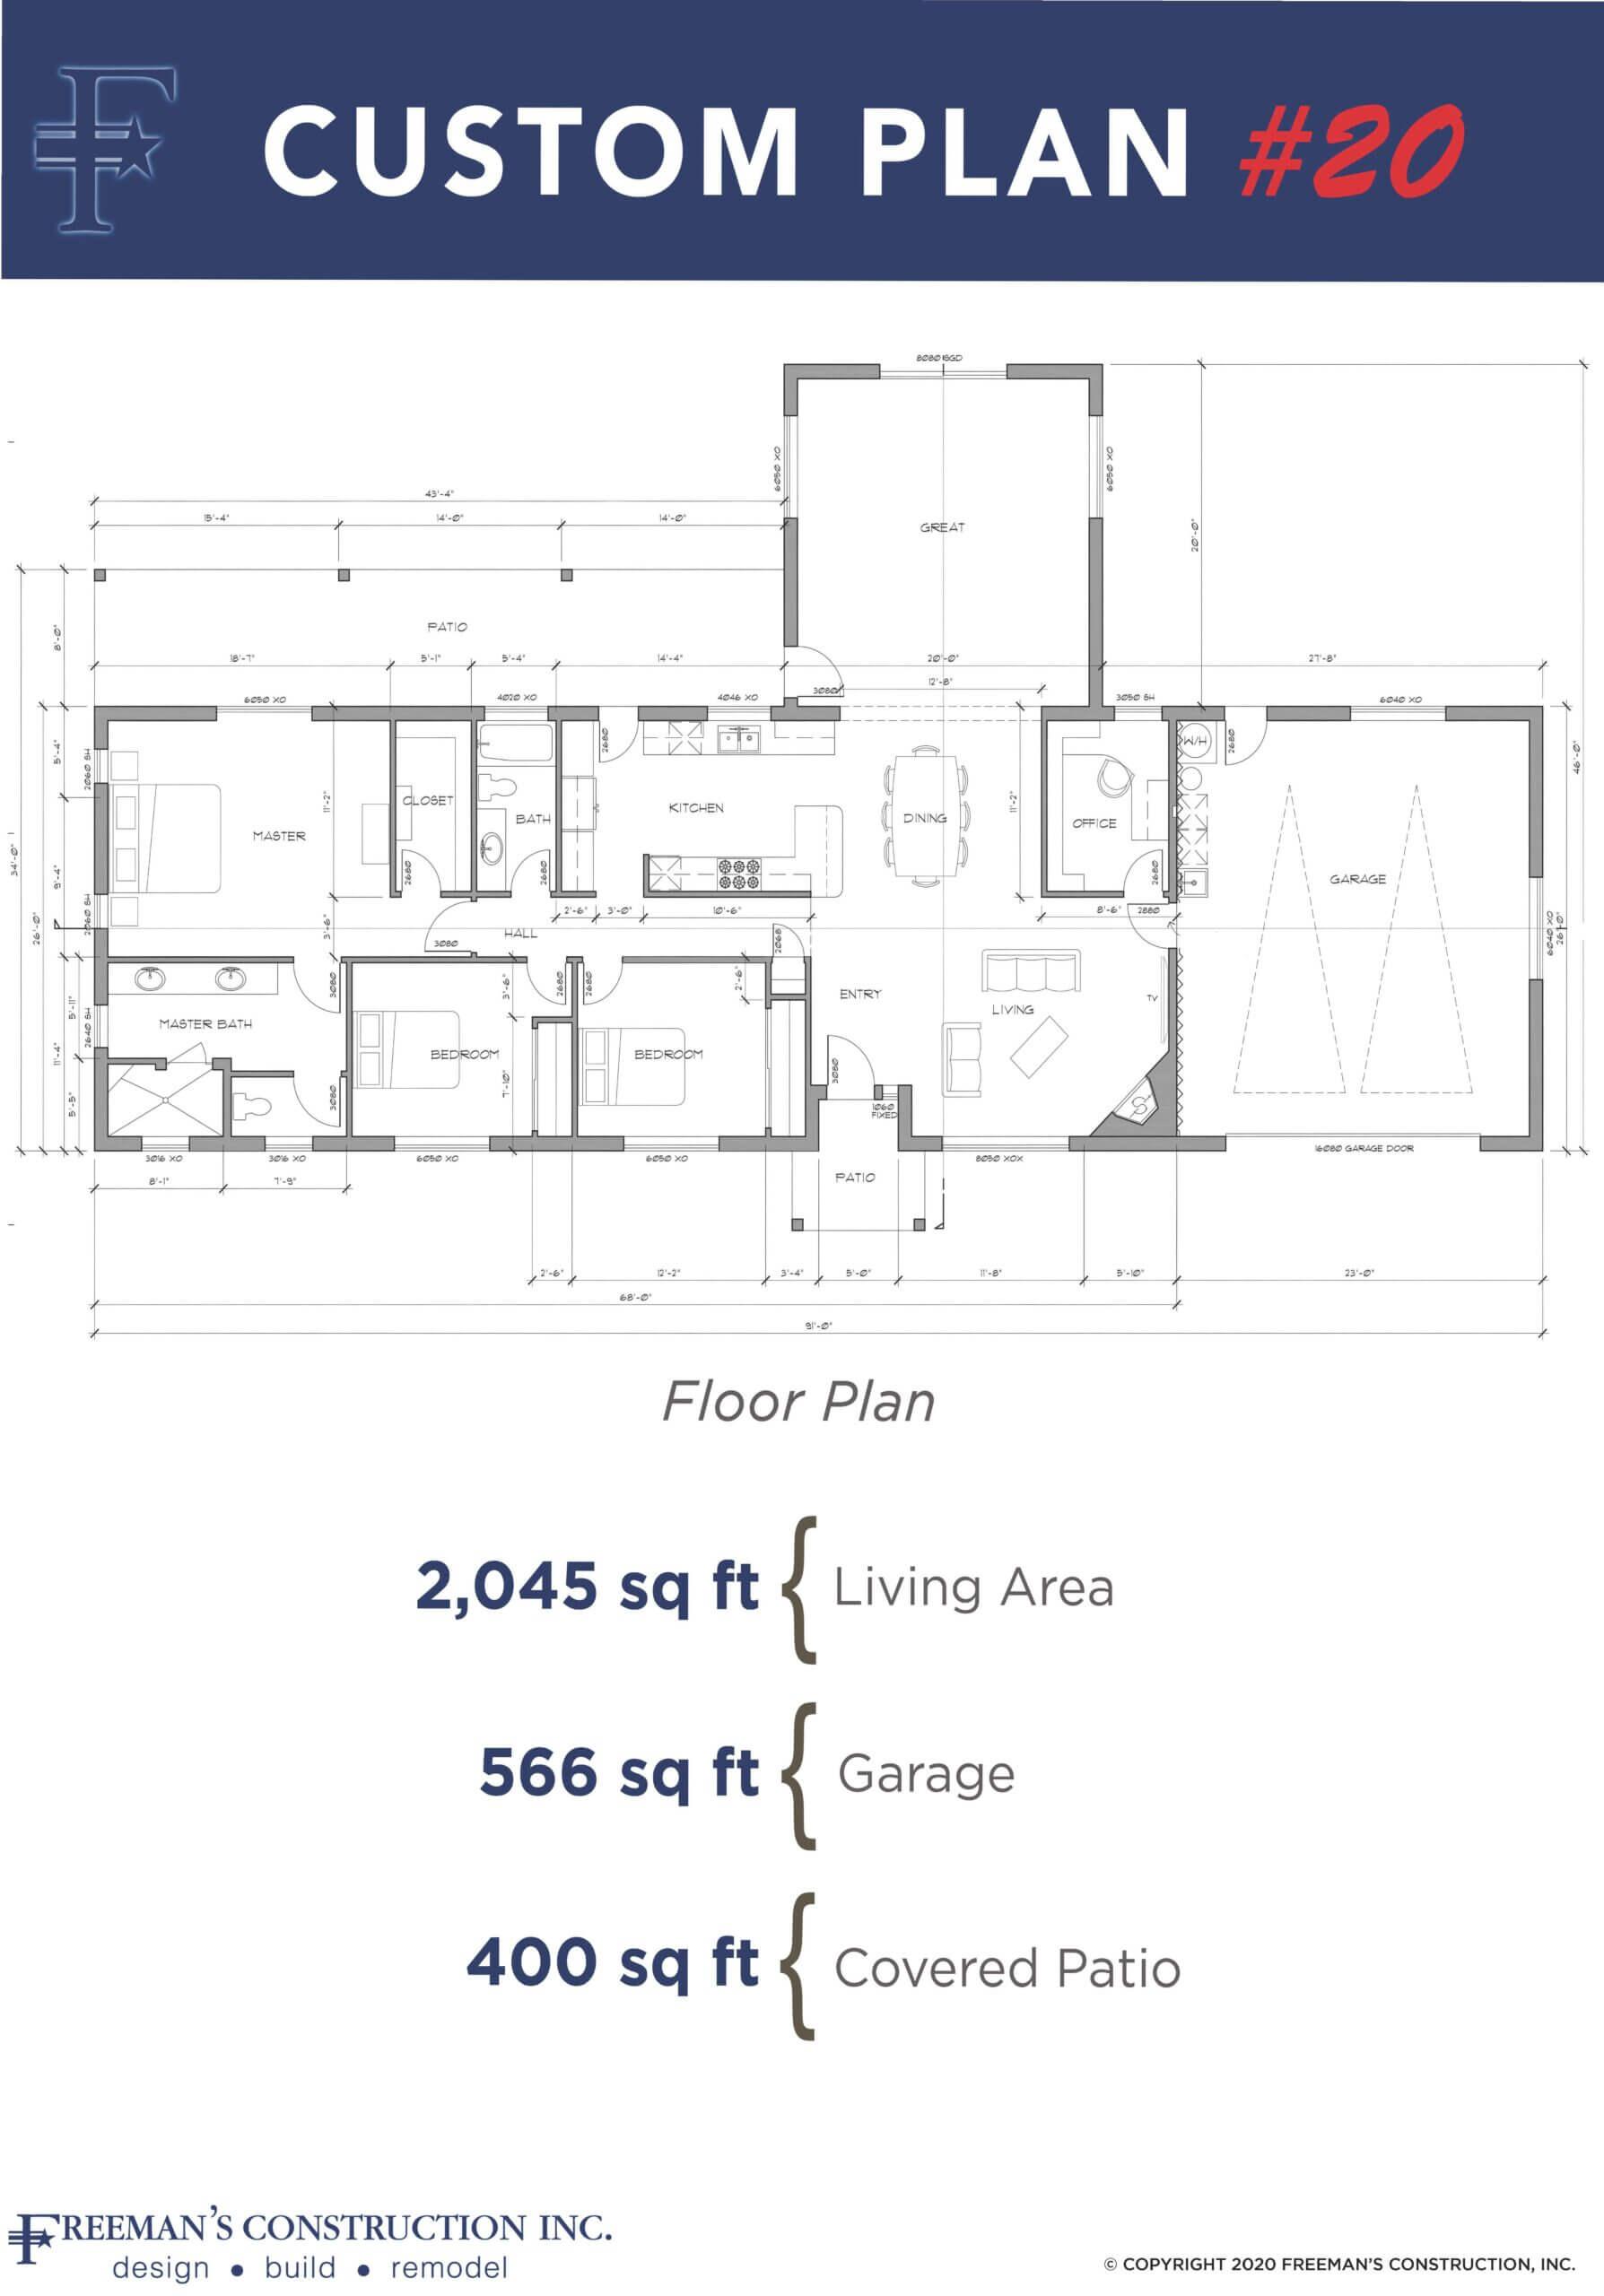 custom-home-floor-plan-20-freemans-constructioninc